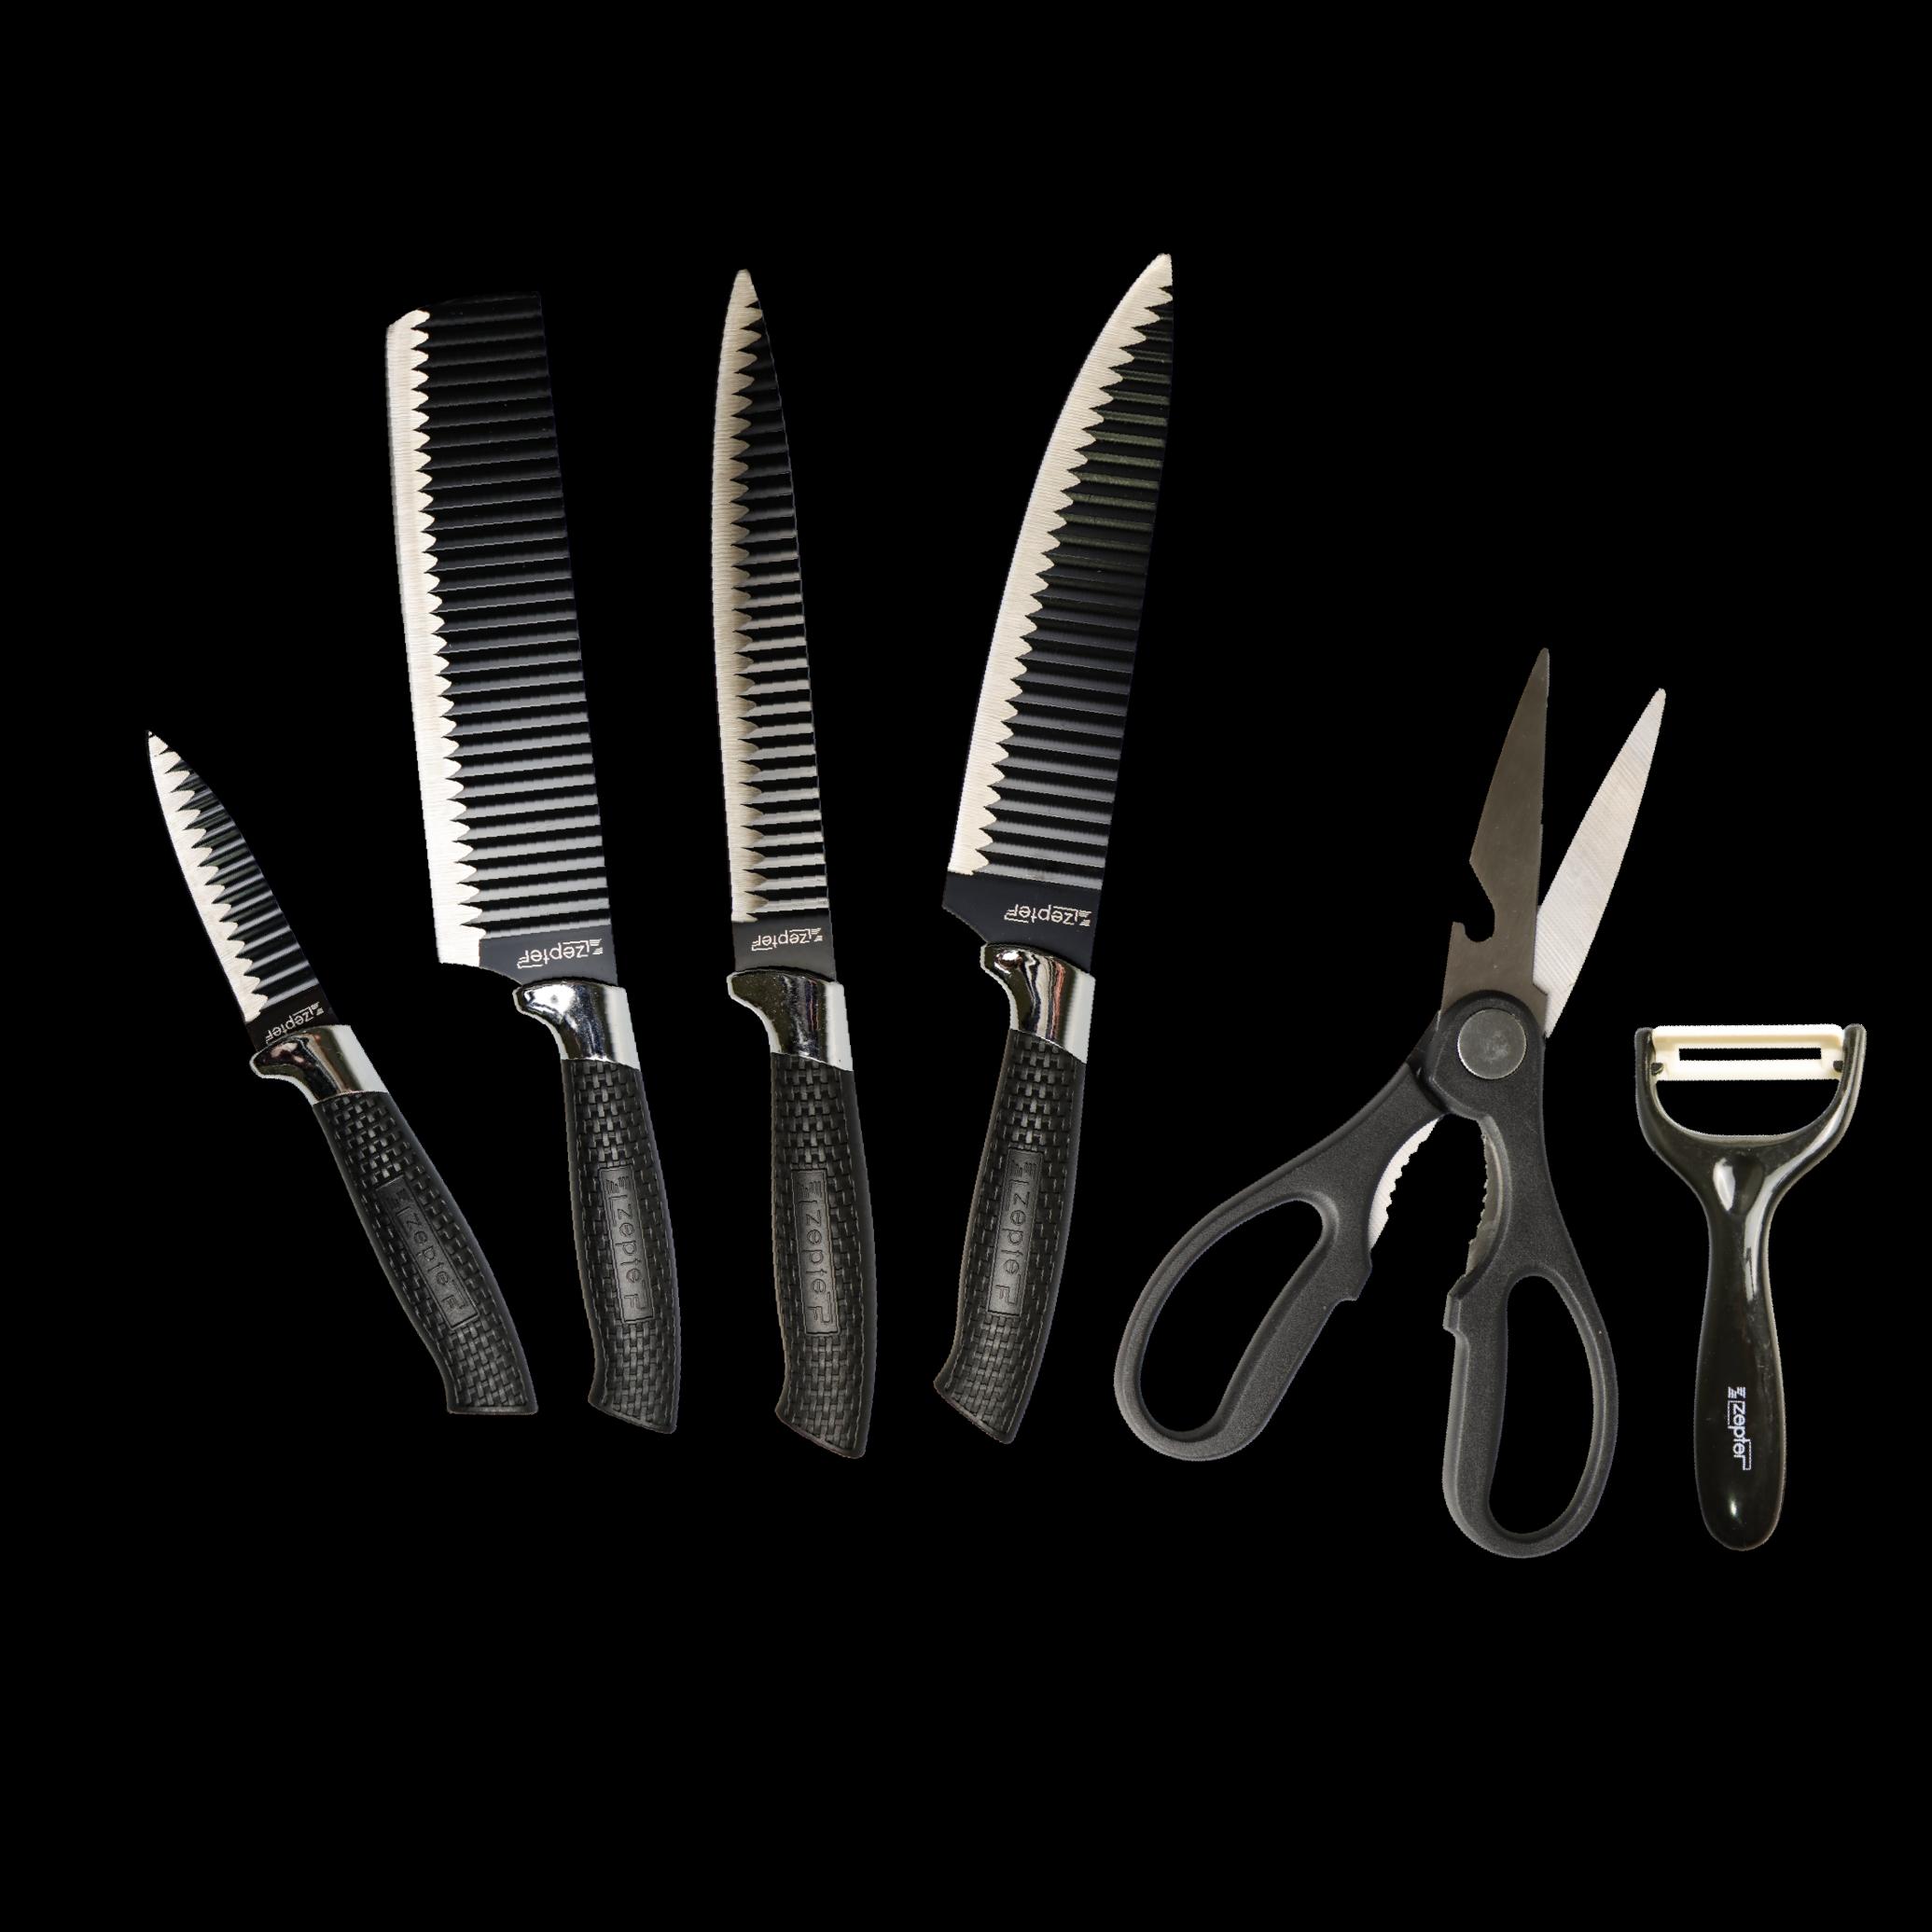 [My Cooking Story / MyCookingStory] ZEPTER PROFESSIONAL 6PCS KNIFE SET